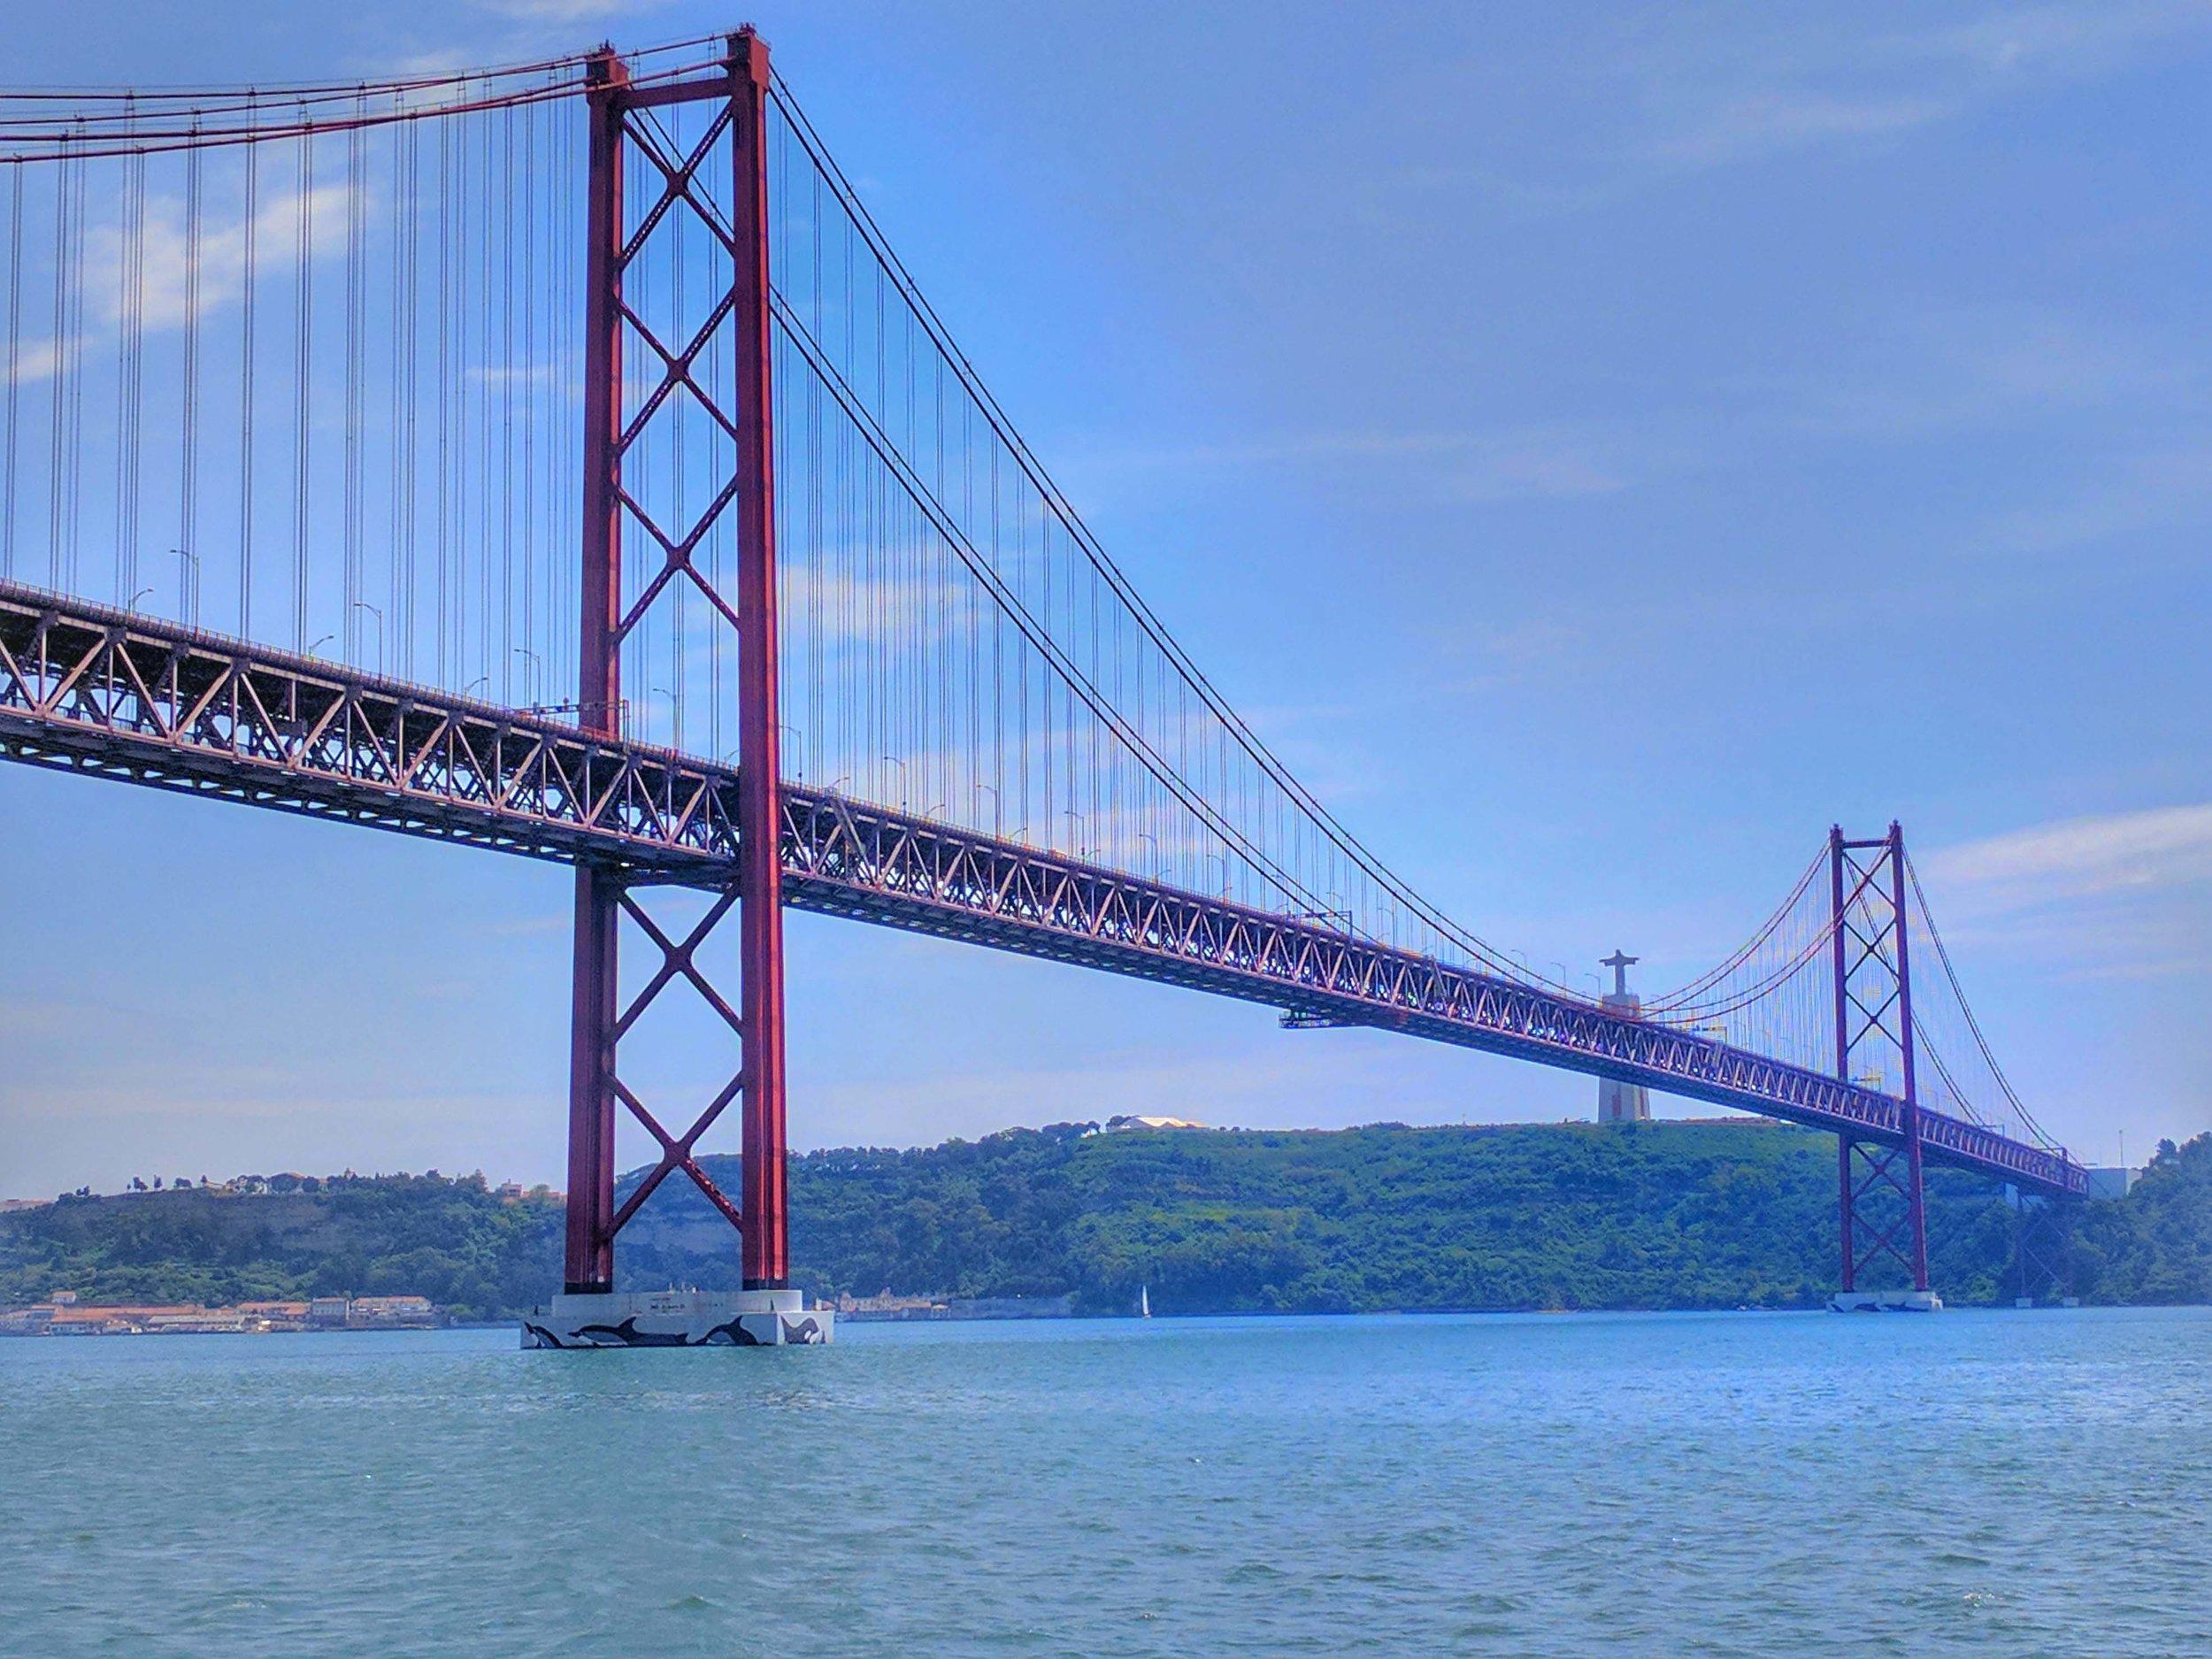 Not the Golden Gate Bridge